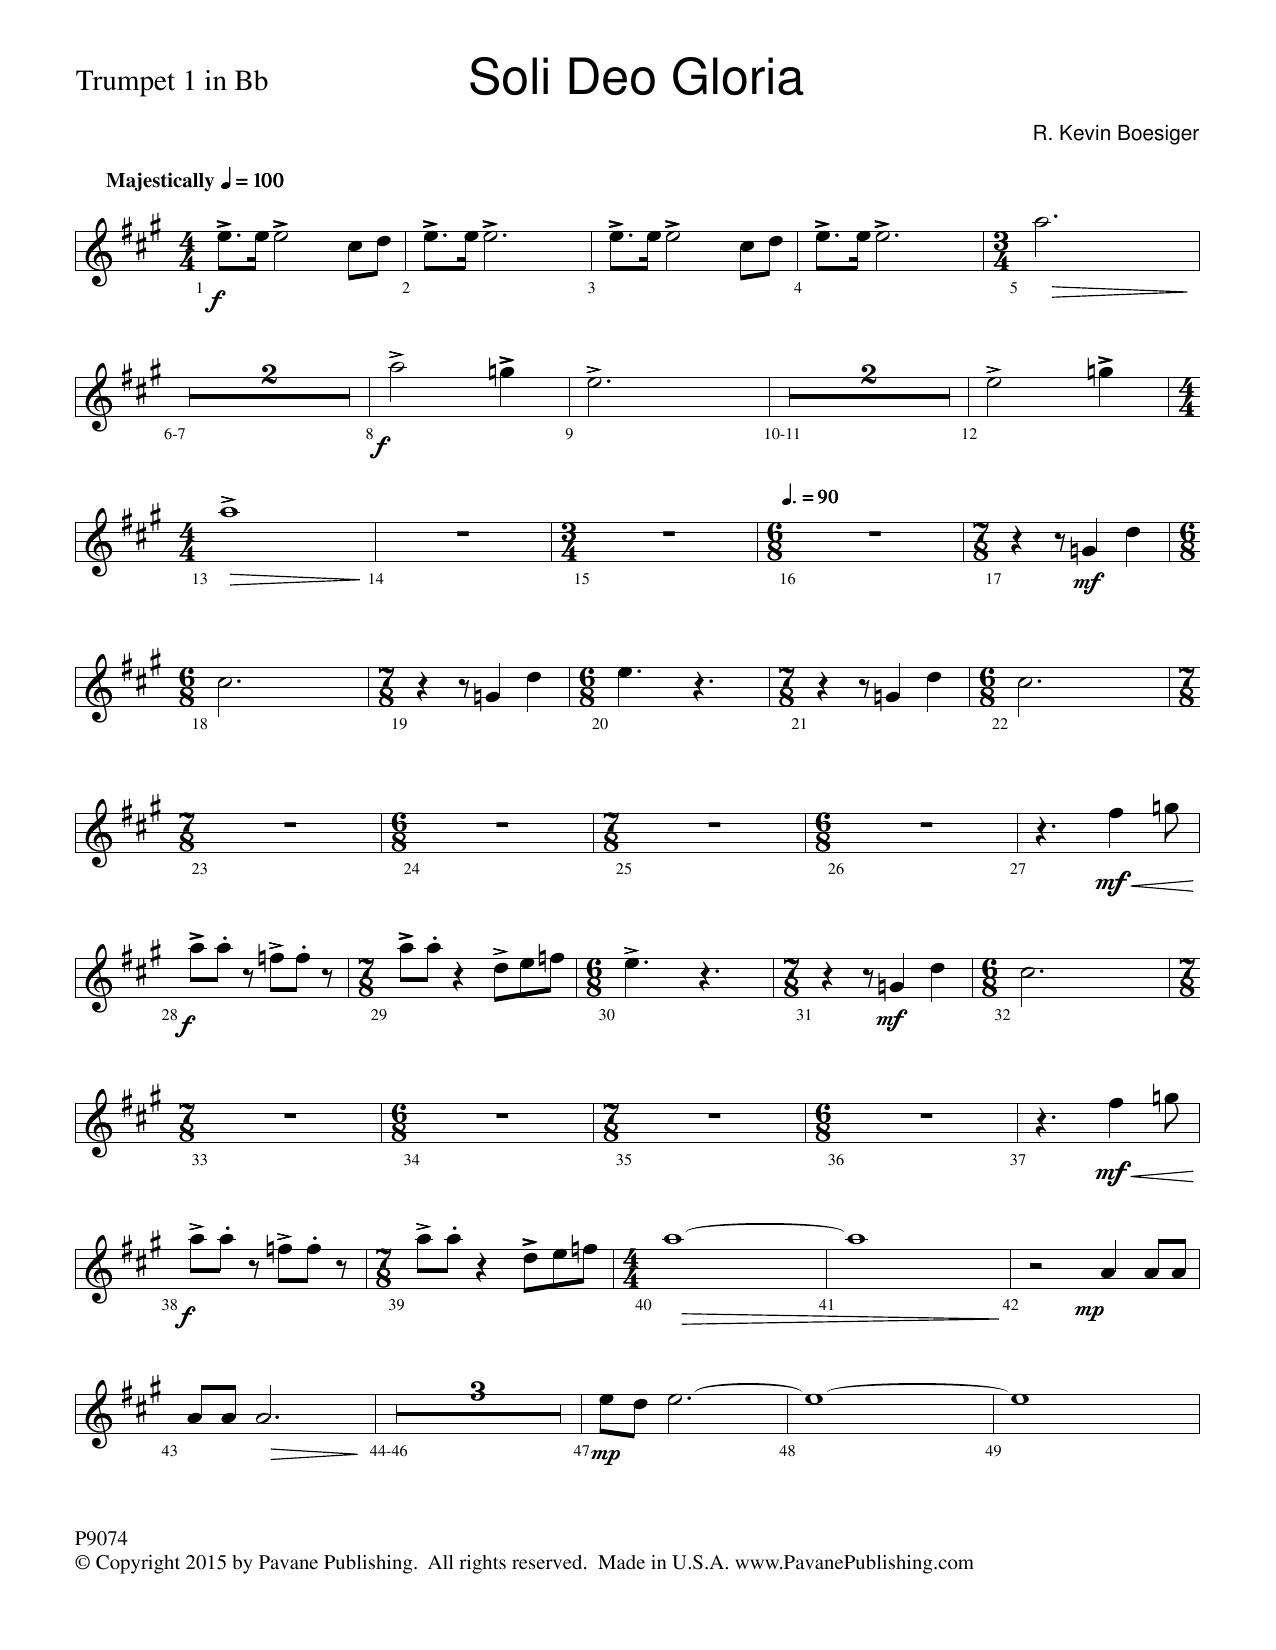 Soli Deo Gloria - Trumpet 1 Sheet Music